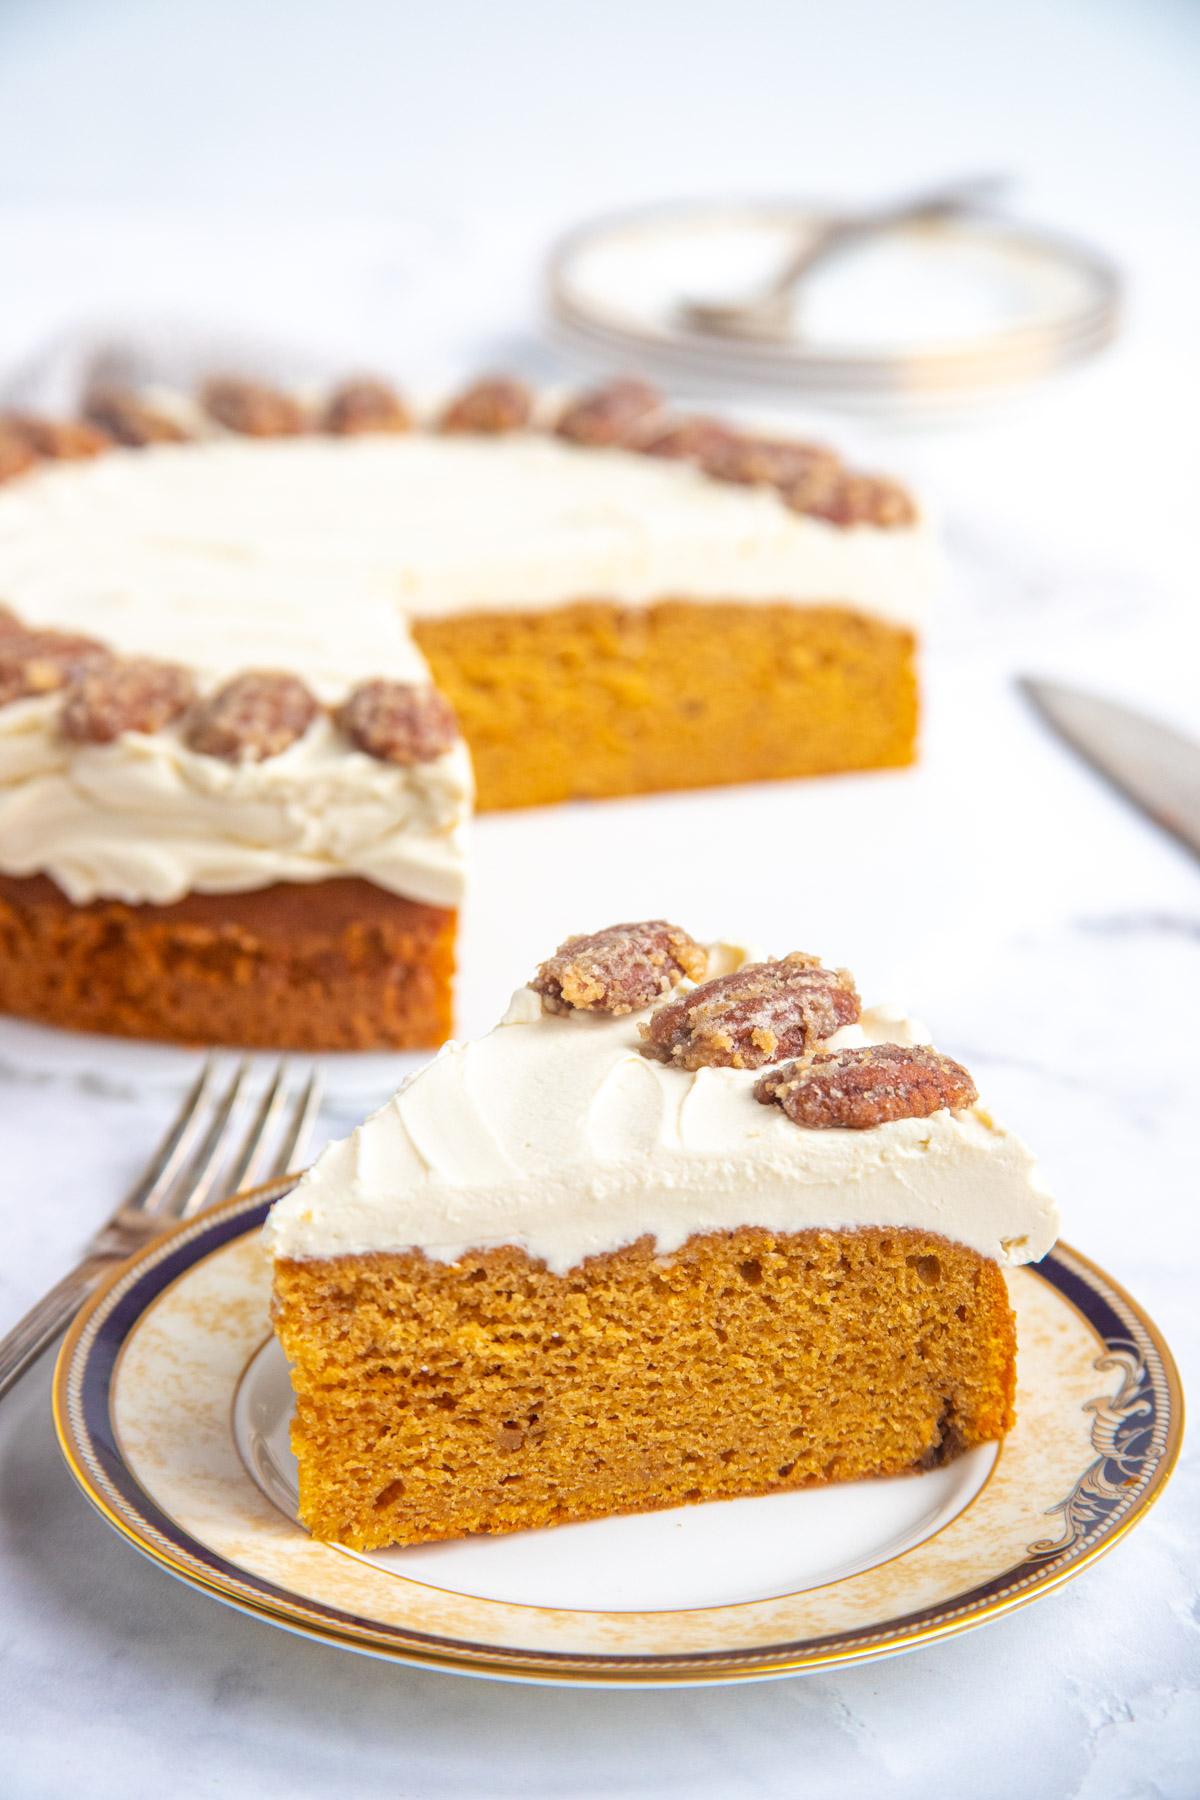 A Slice of Sweet Potato Sour Cream Cake